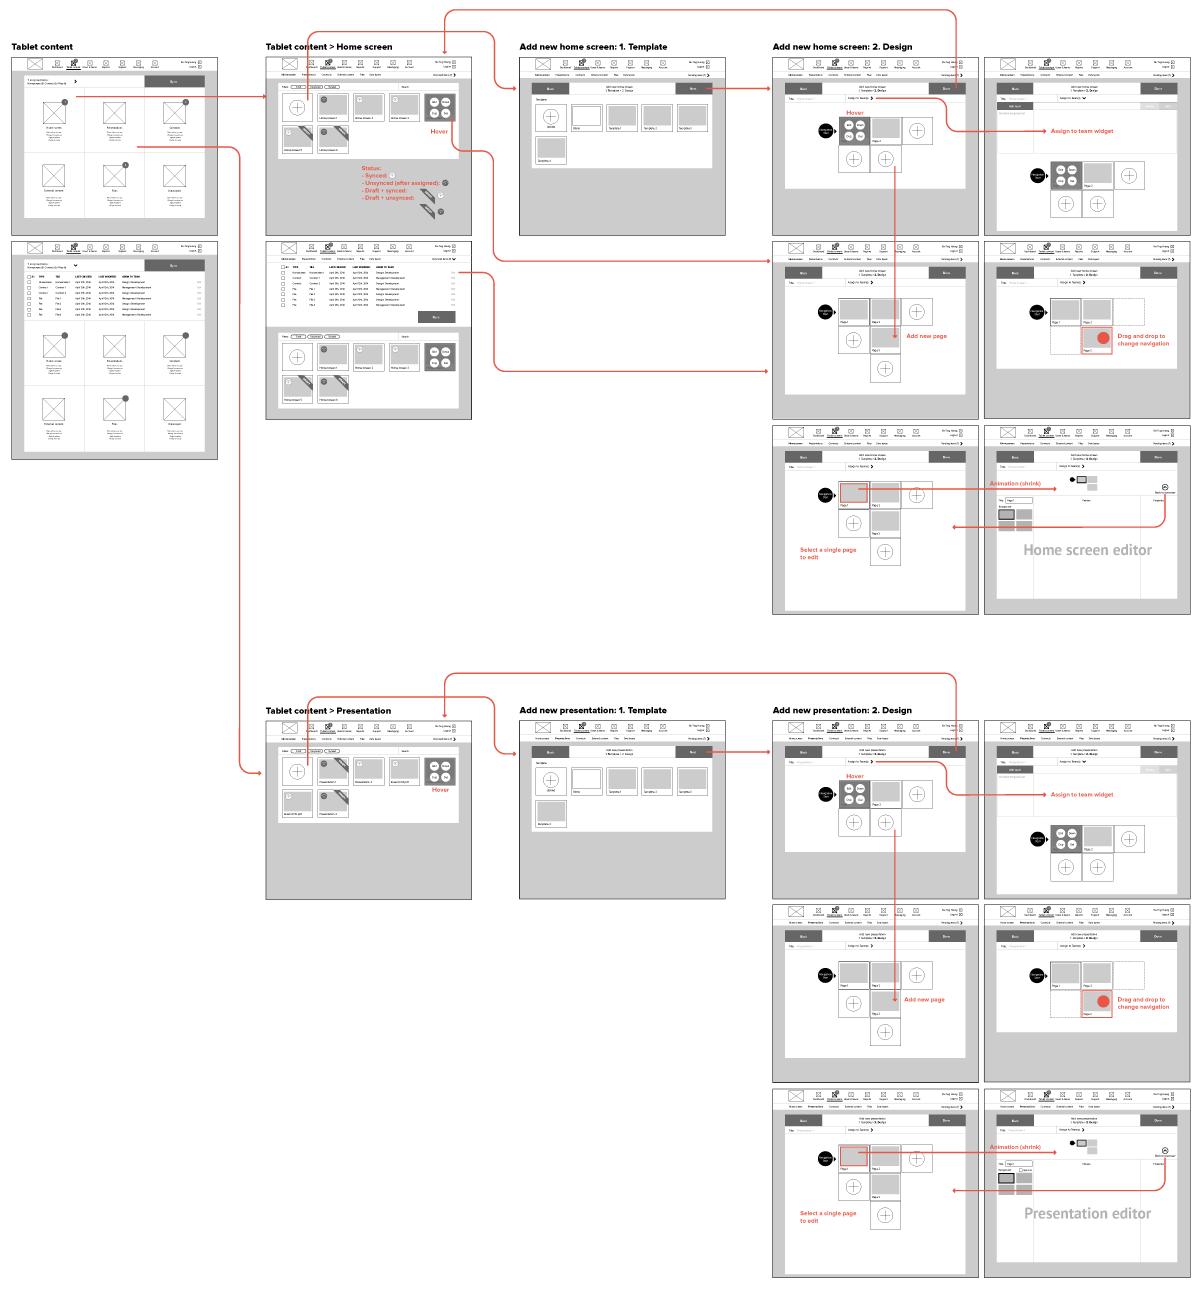 The pitch card editor & presentation editor: Interaction design